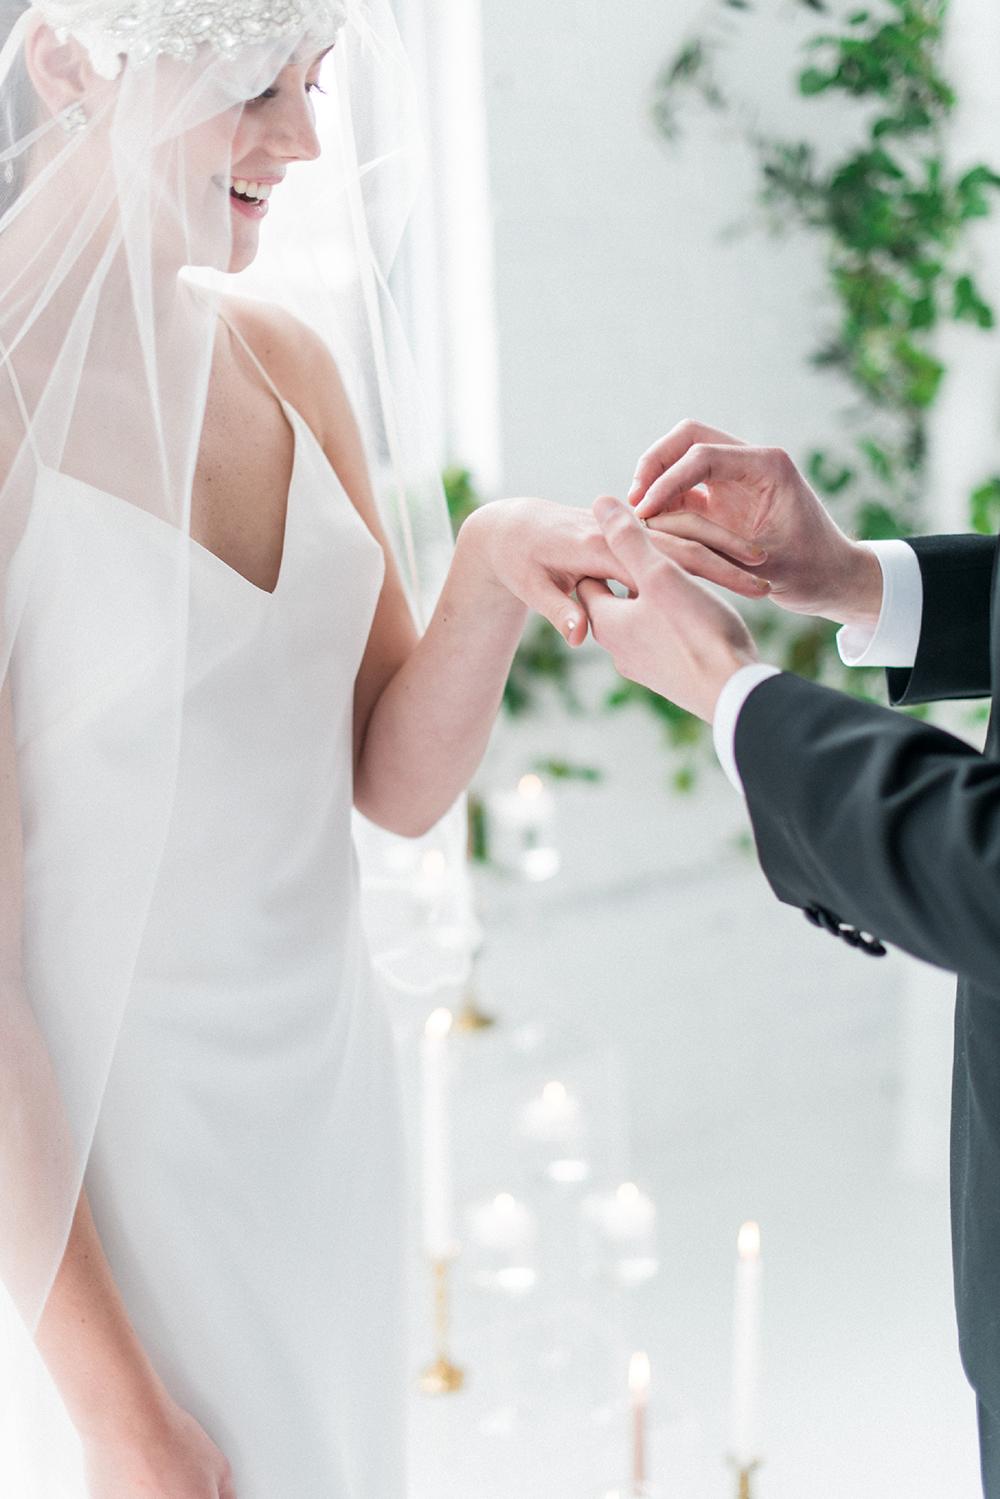 ring exchange - photo by Laura Kelly Photography http://ruffledblog.com/minimalist-monochrome-european-wedding-inspiration